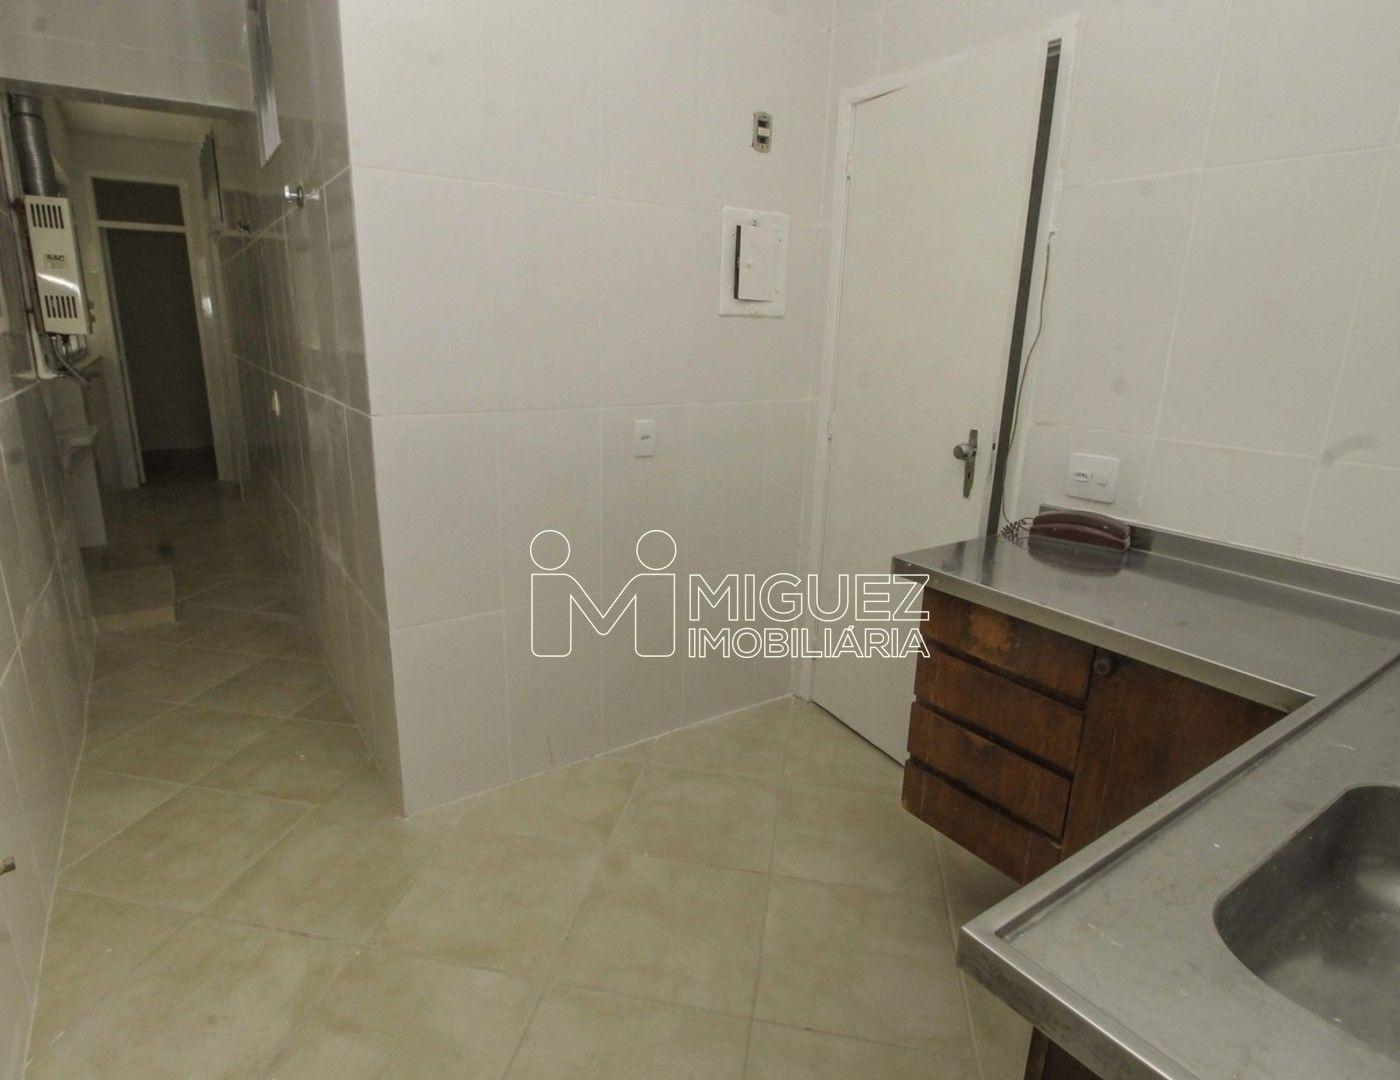 Apartamento, aluguel, Rua Santa Amélia - Tijuca , Rio de janeiro